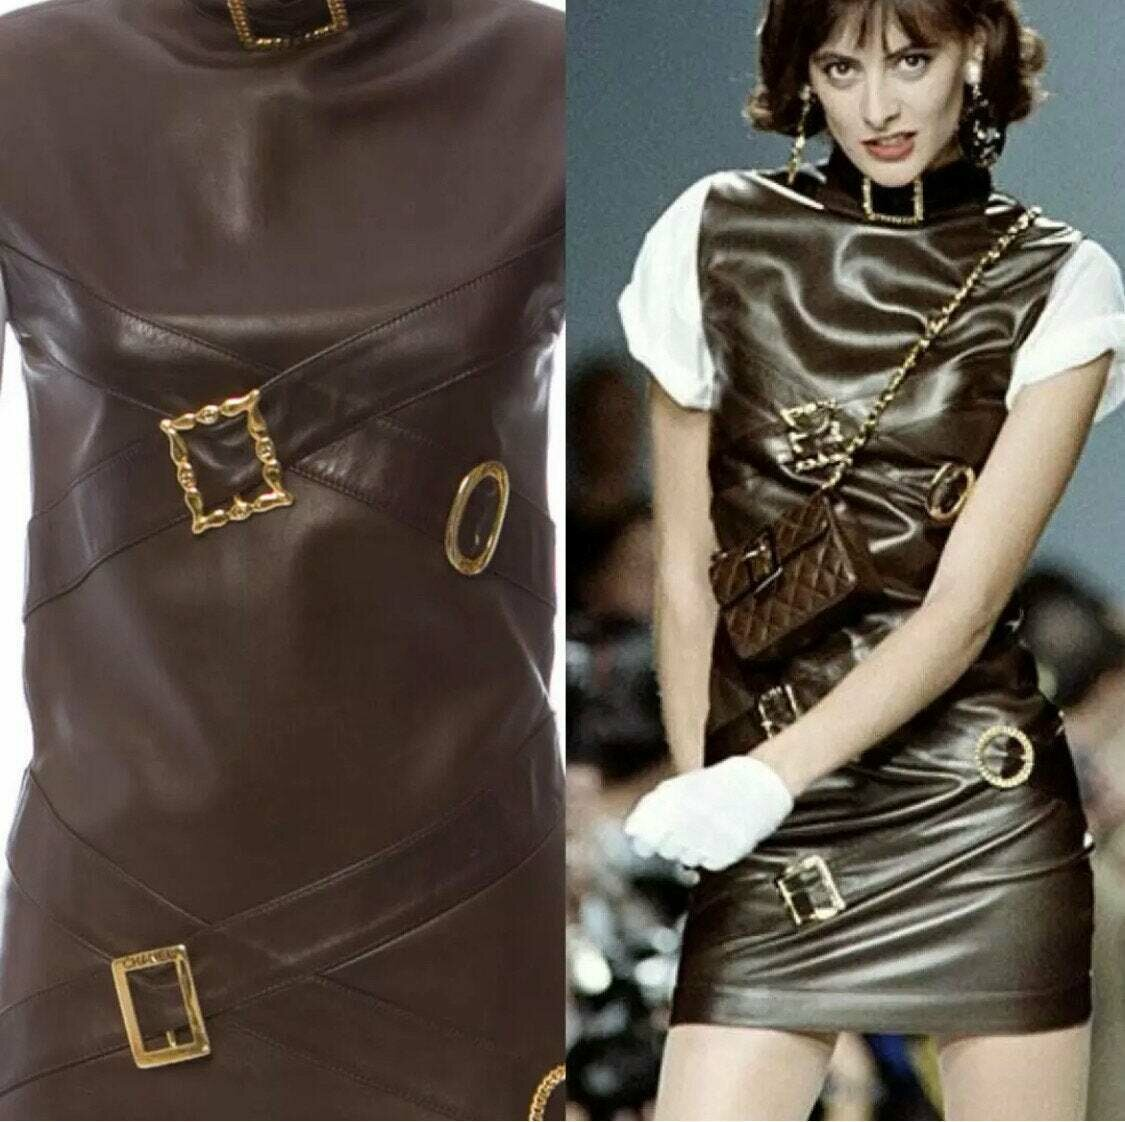 Vintage CHANEL CC Logo Monogram Belt Buckle Brown Leather Dress - RARE Runway Collectors item!!